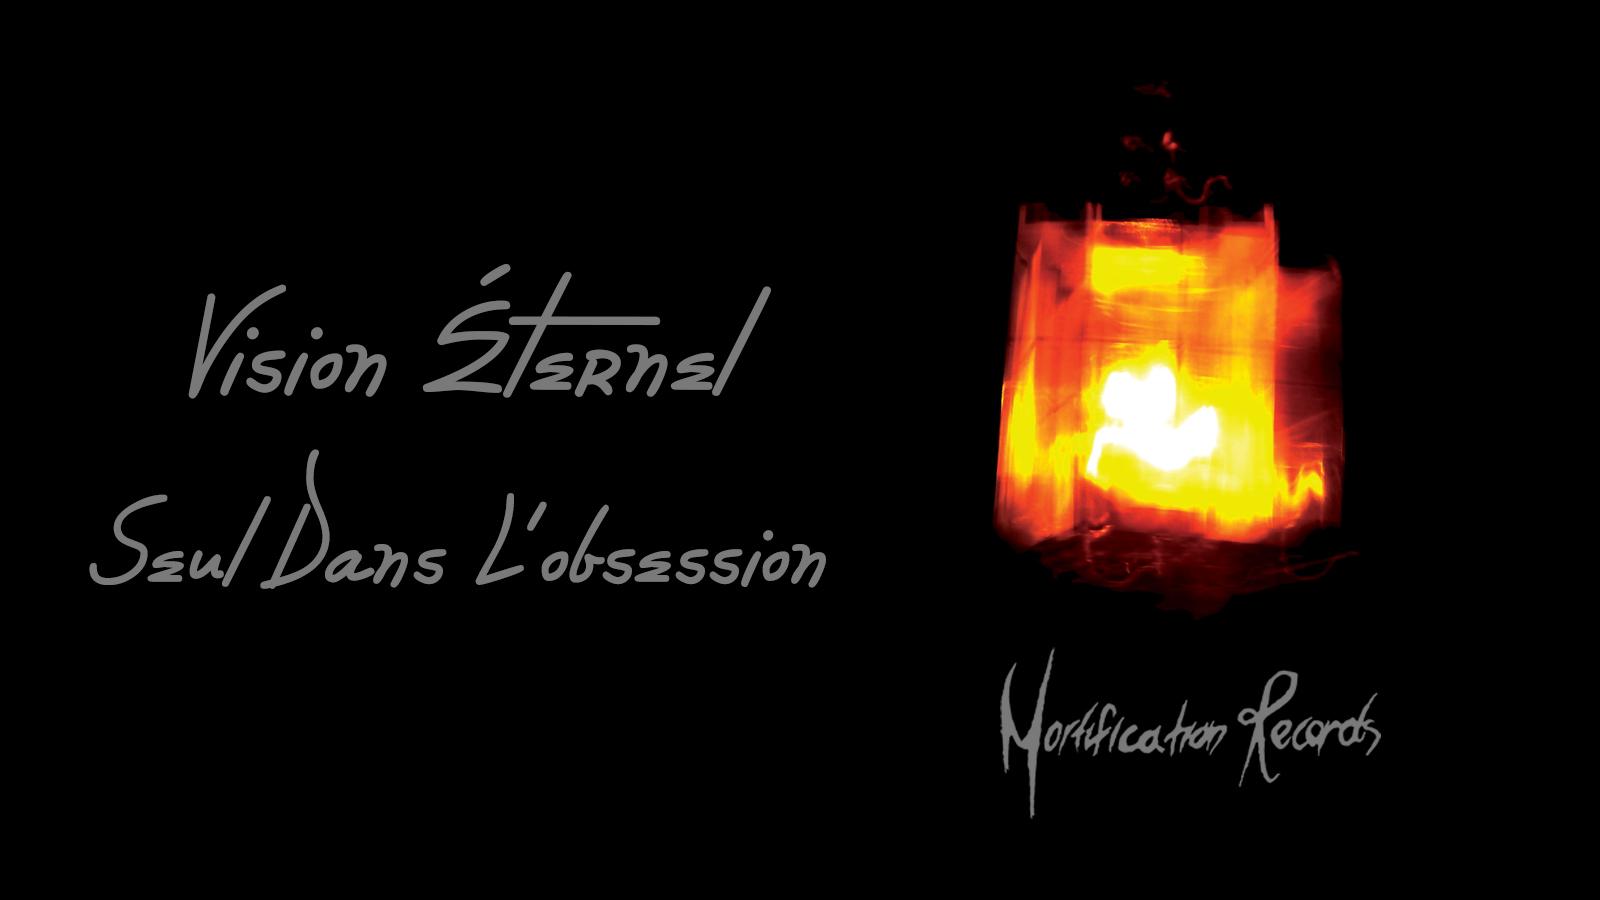 Vision Éternel Seul Dans L'obsession EP Is Released